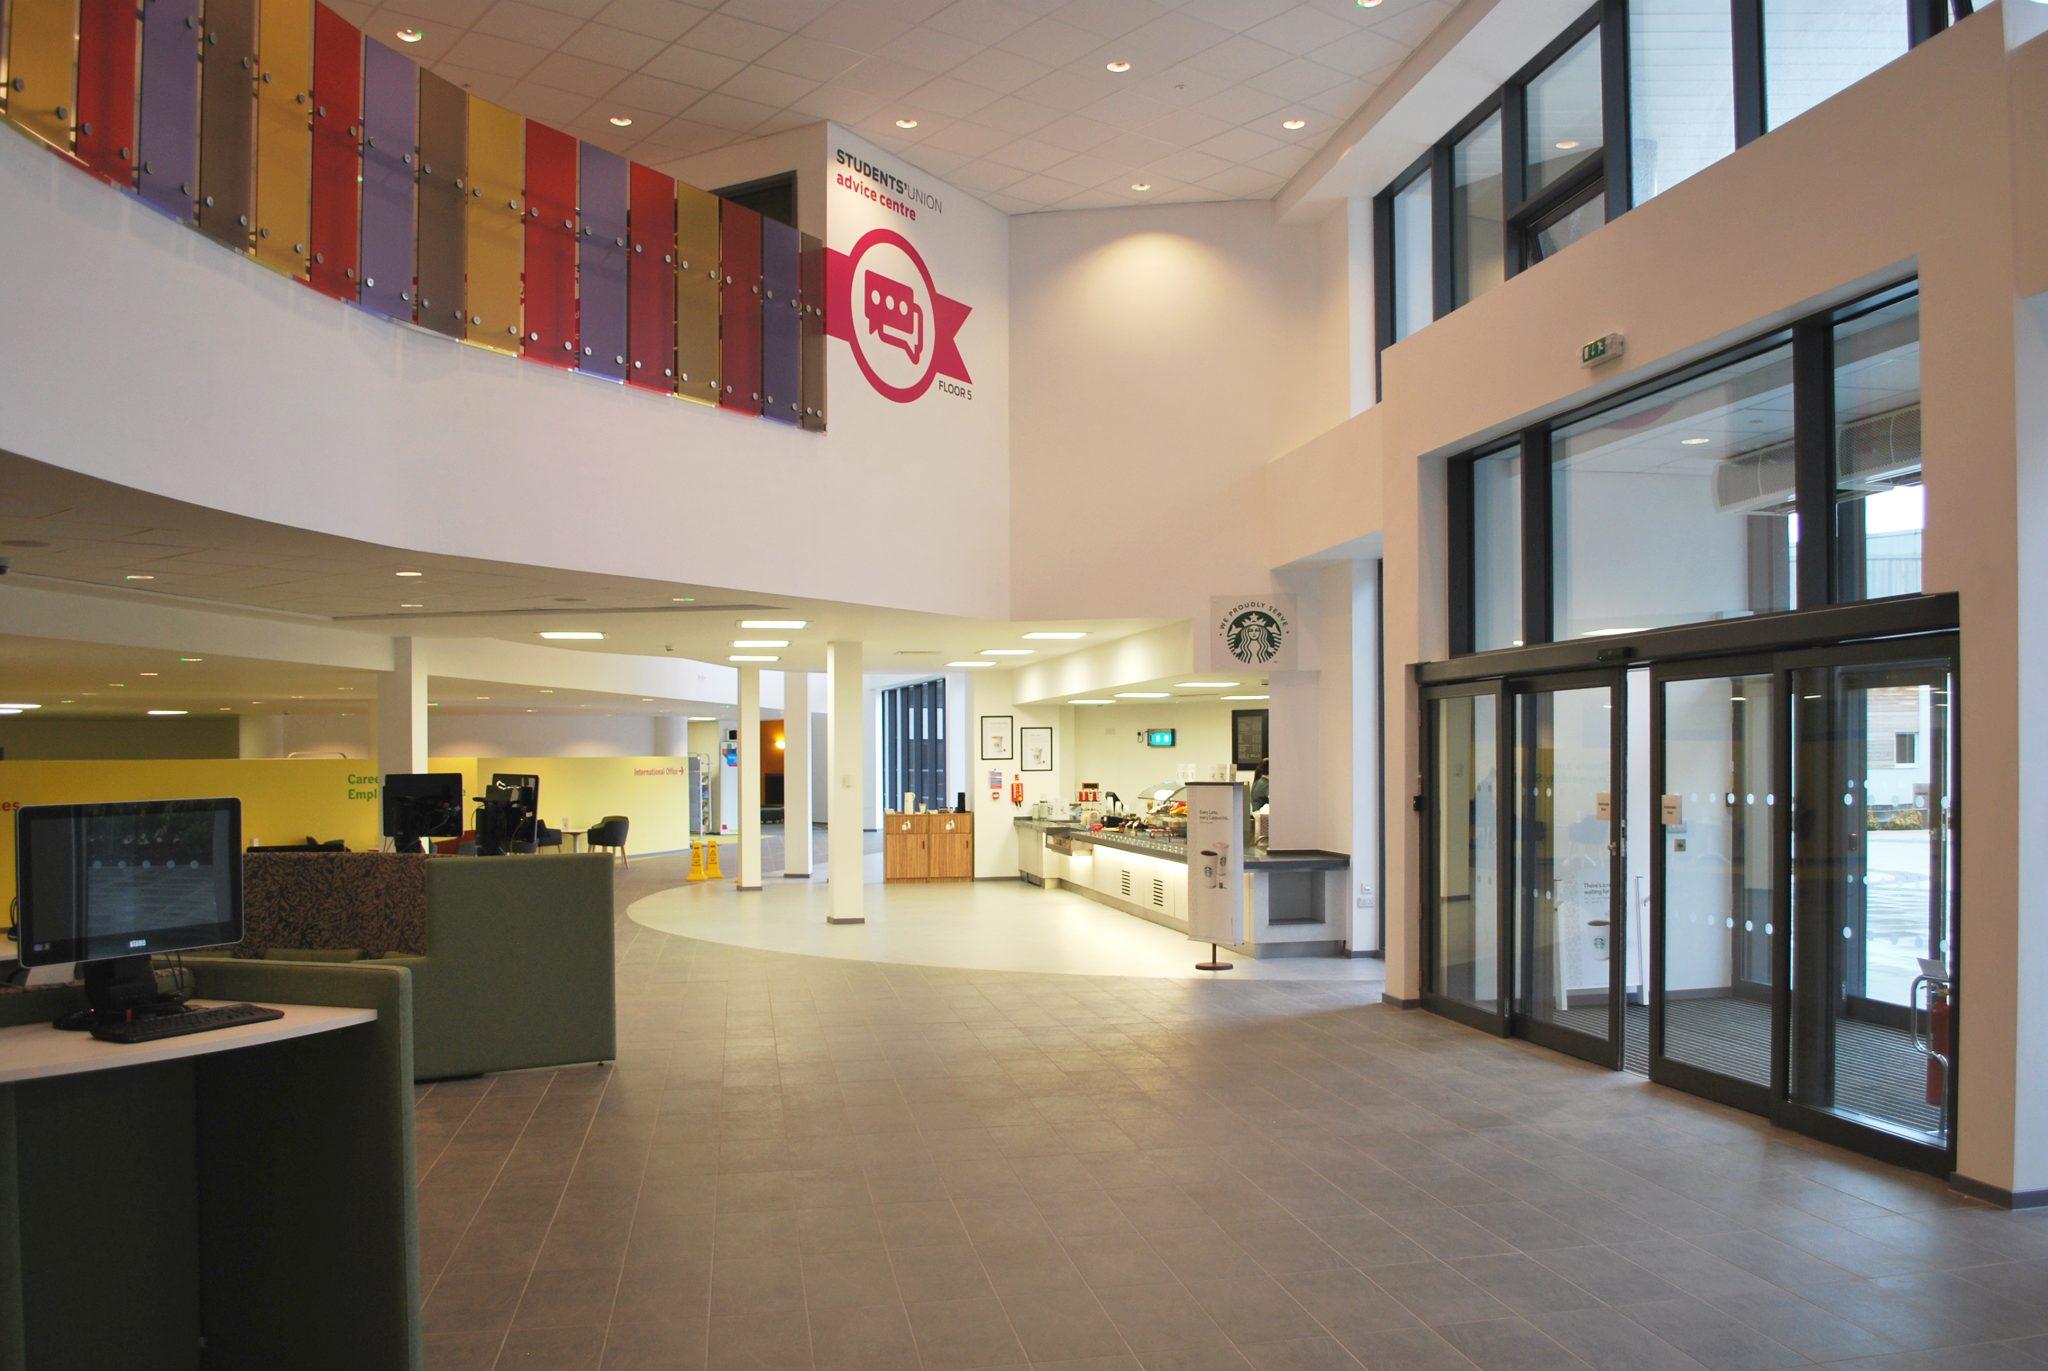 University of Huddersfield International Study Centre ...